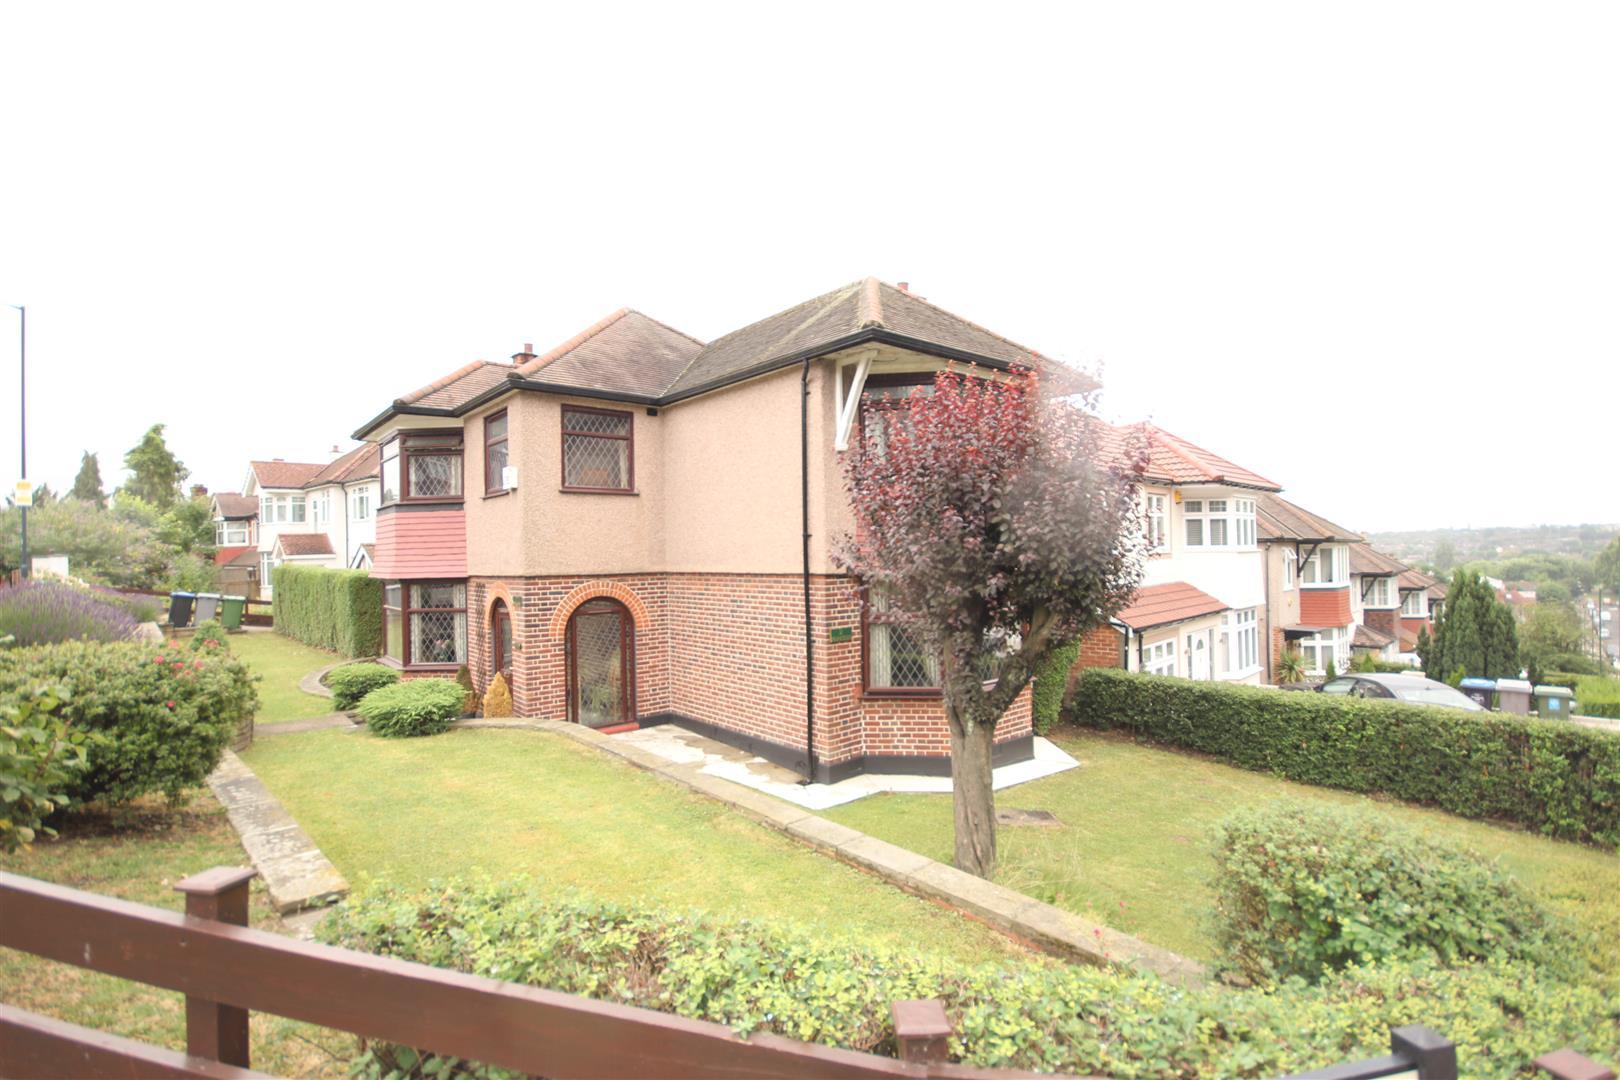 4 Bedrooms House for sale in Parkside, PEN-Y-BRYN, London NW2 6RH